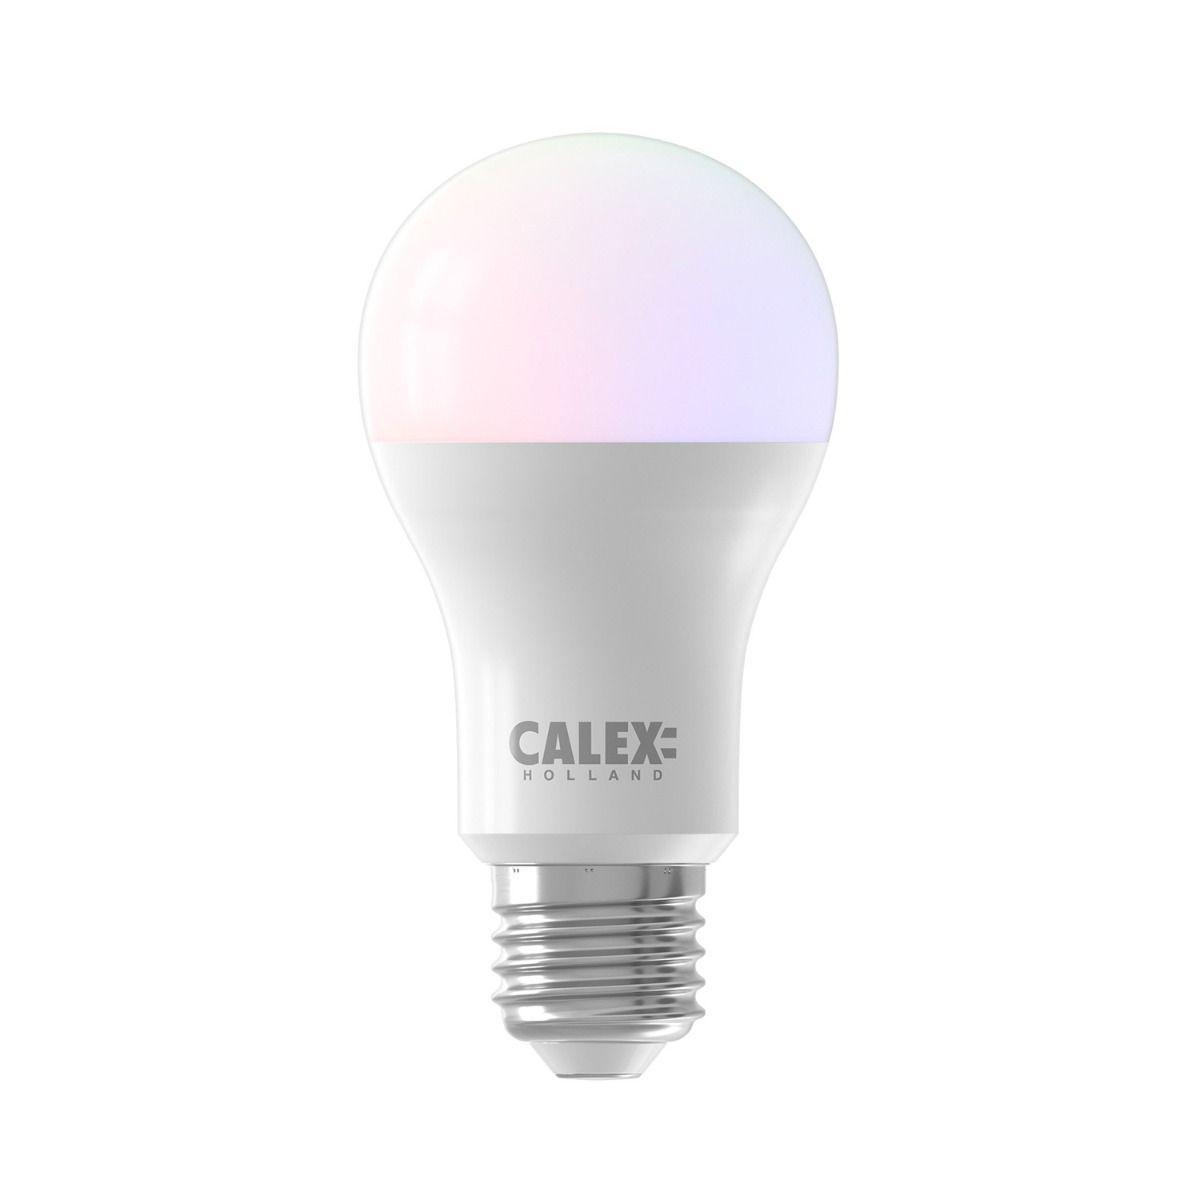 Calex Smart Standard LED Bulb E27 8,5W 806lm 2200-4000K | Tuya Wifi